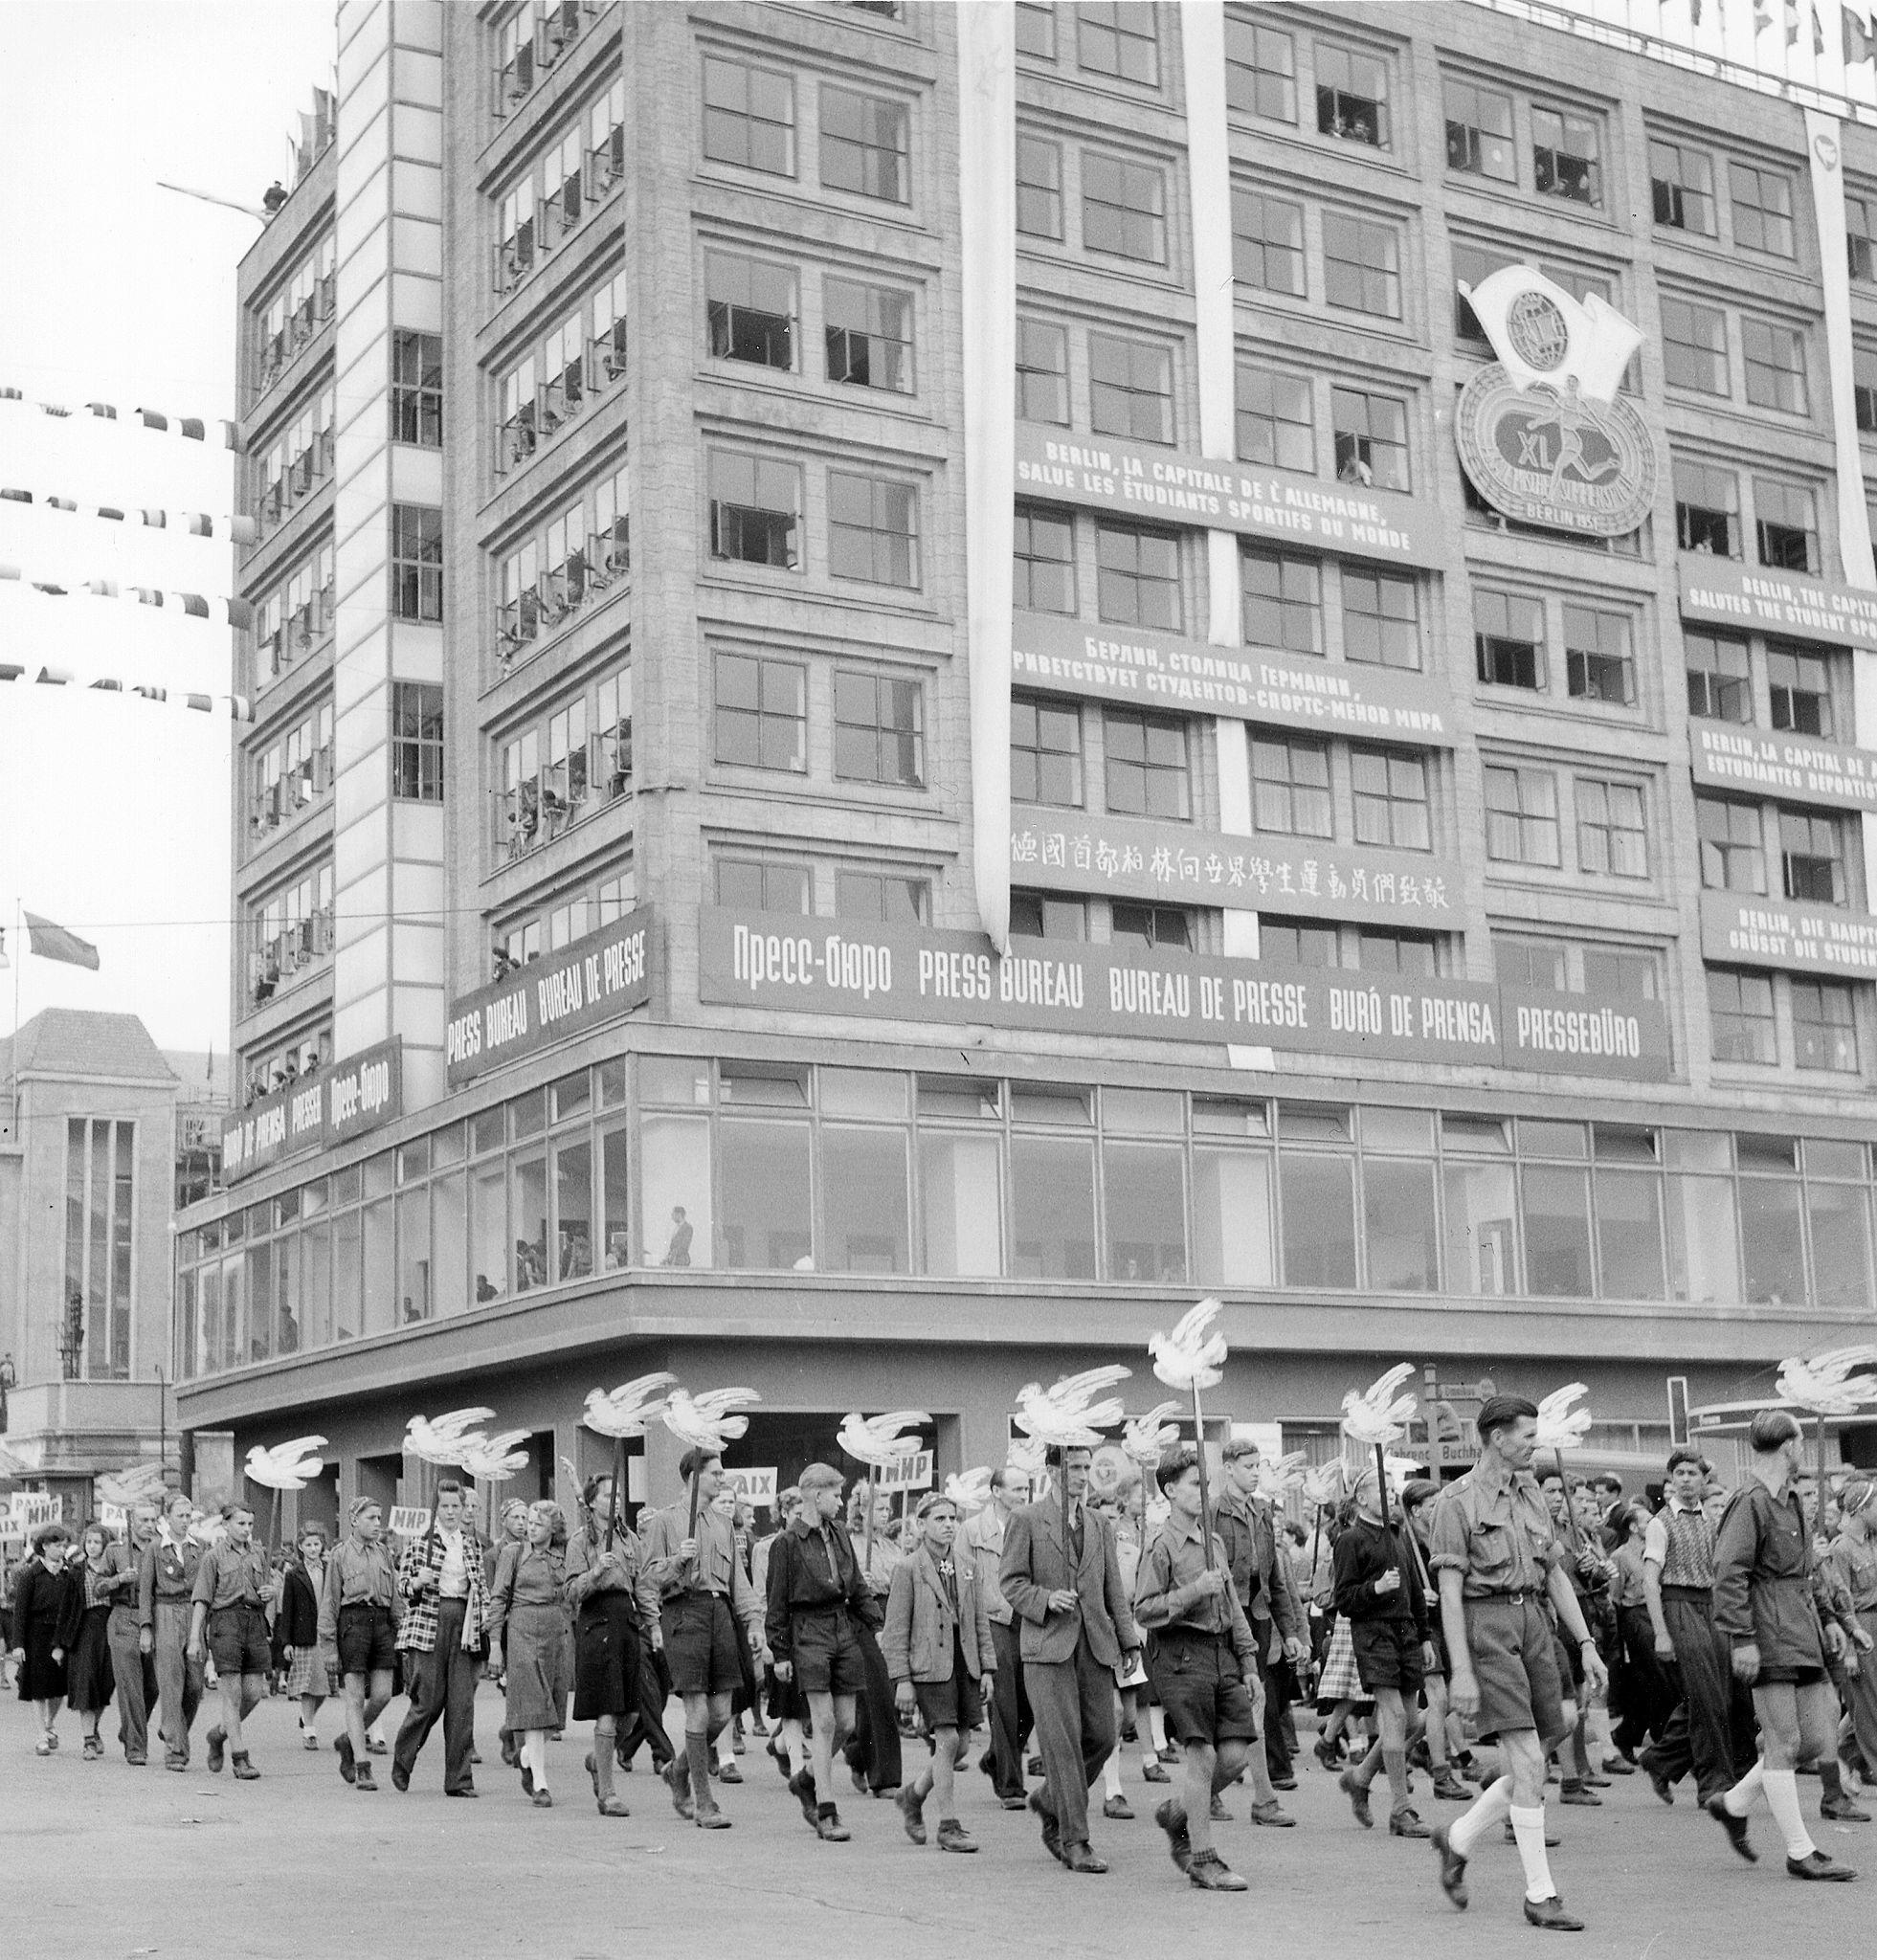 1951. Демонстрация на Александрплац